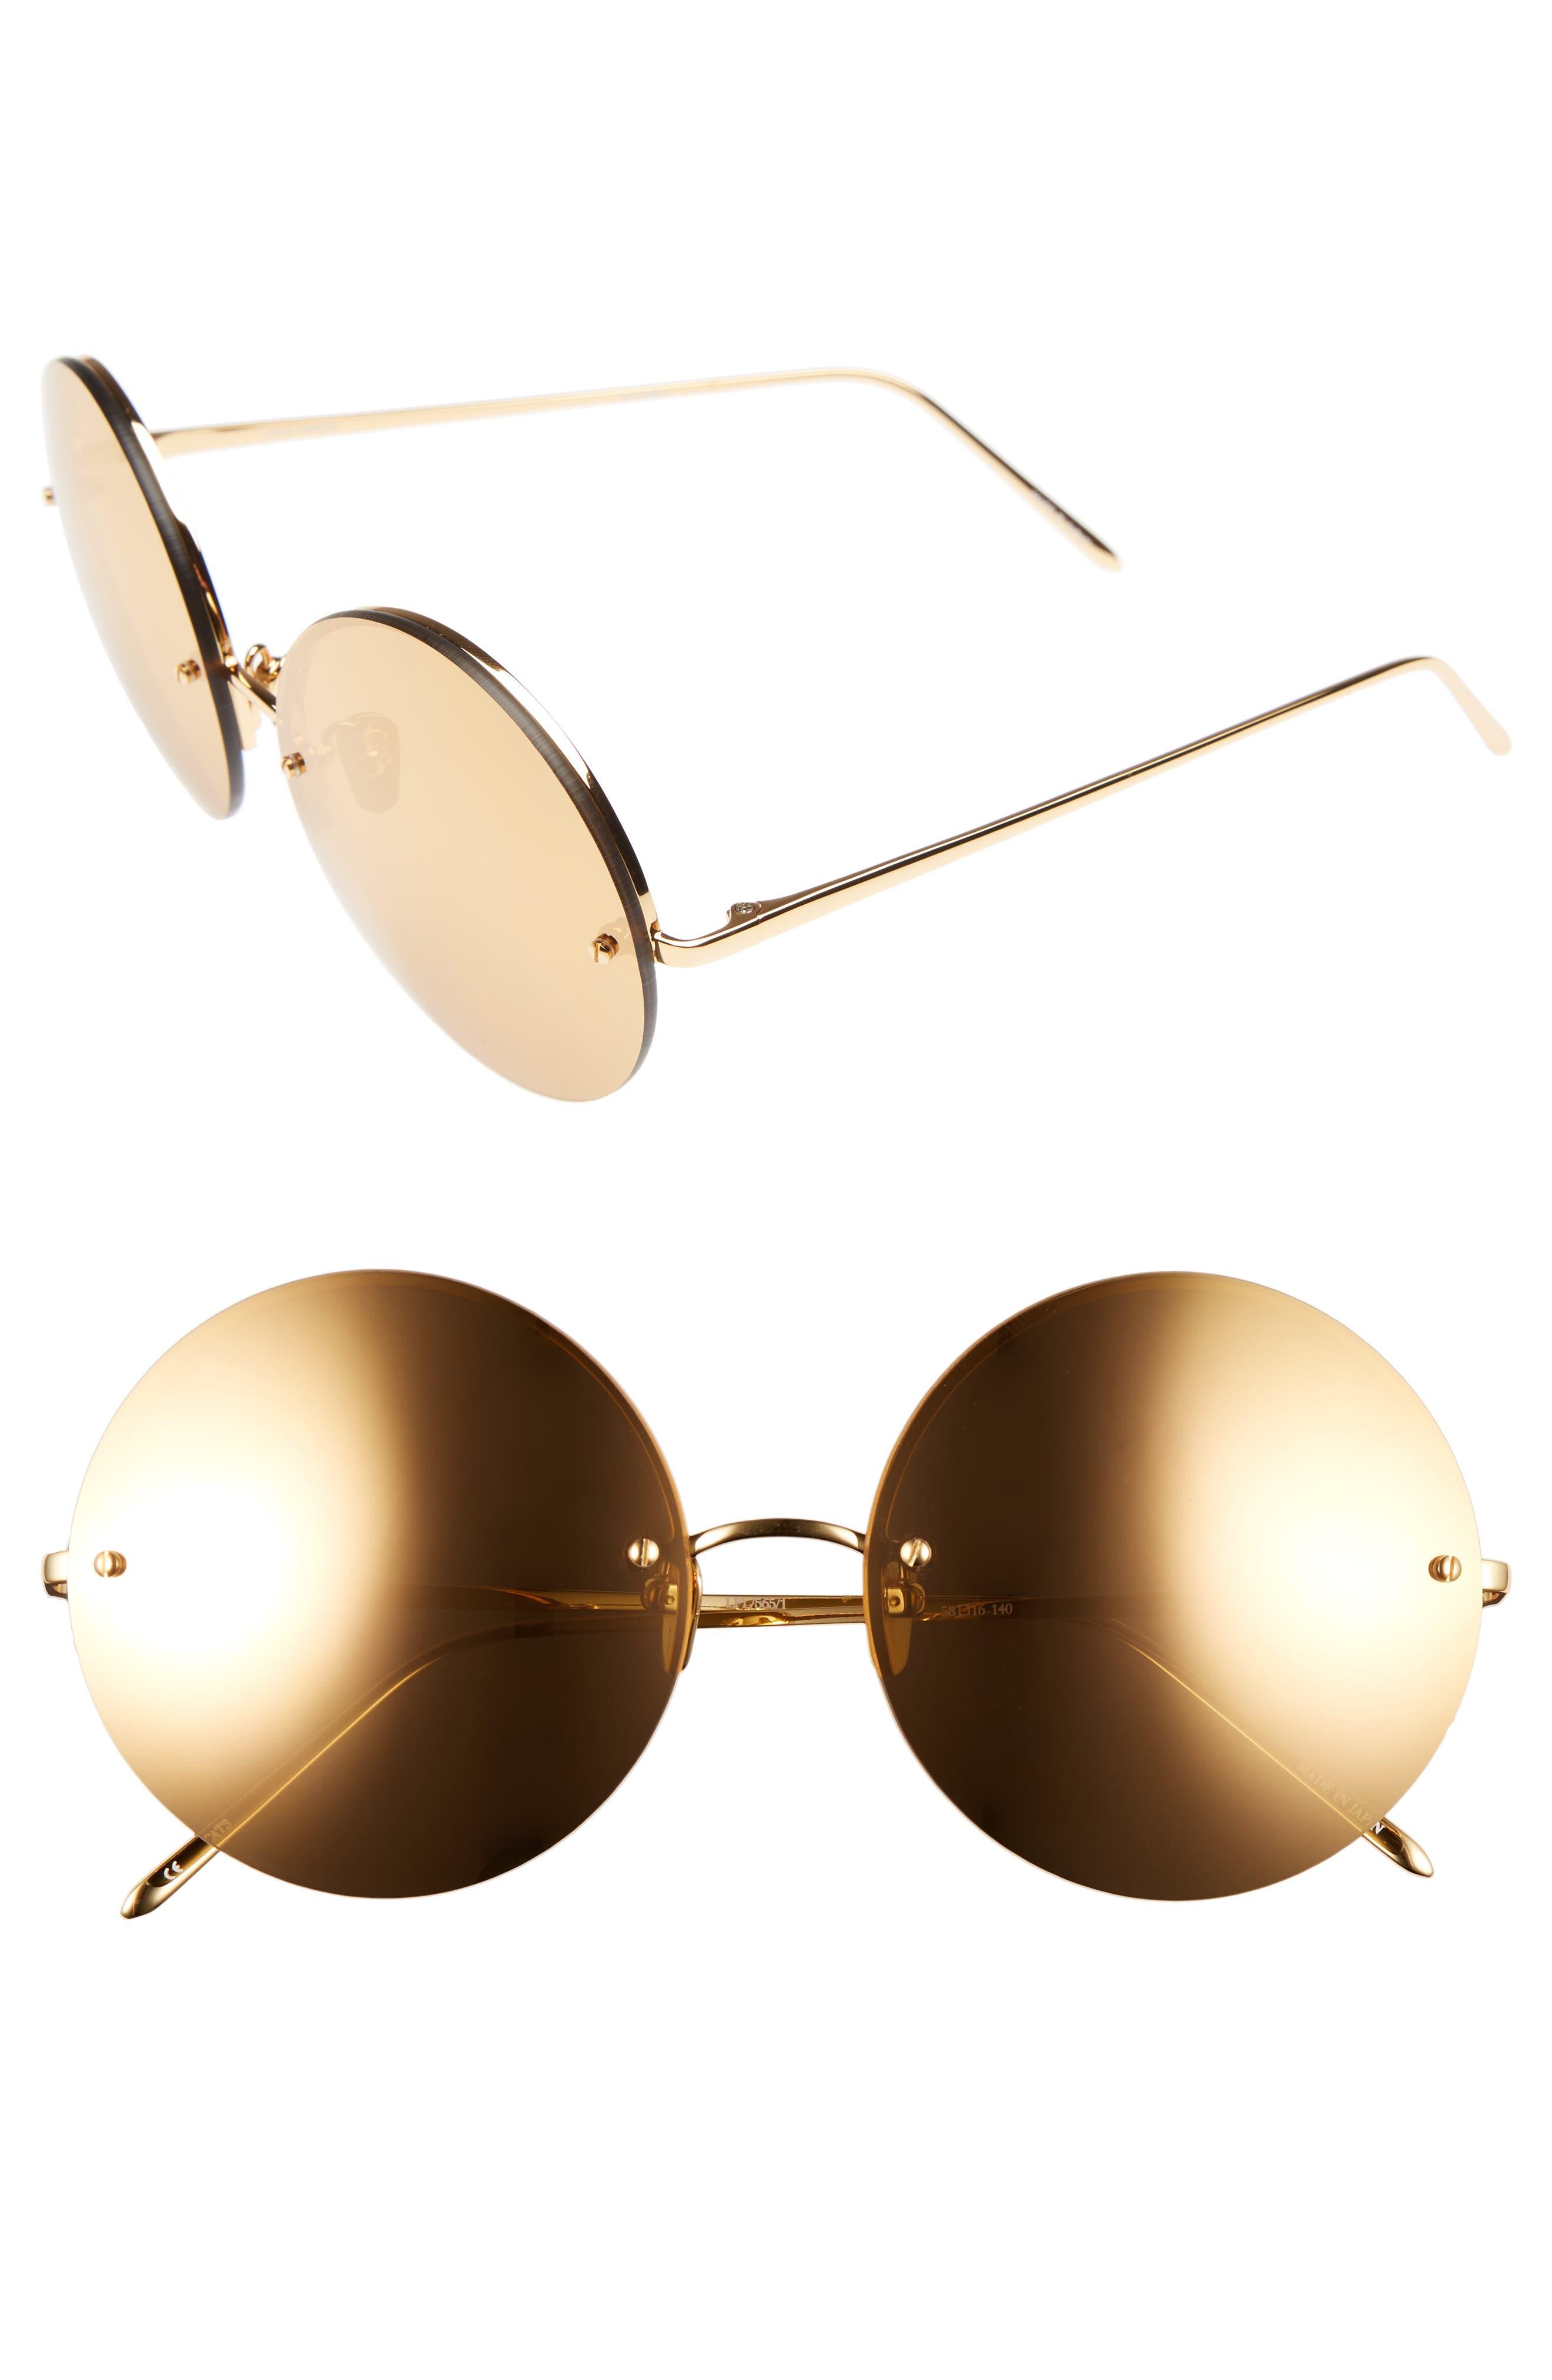 58mm 22 Karat Gold Trim Rimless Round Sunglasses,                             Main thumbnail 1, color,